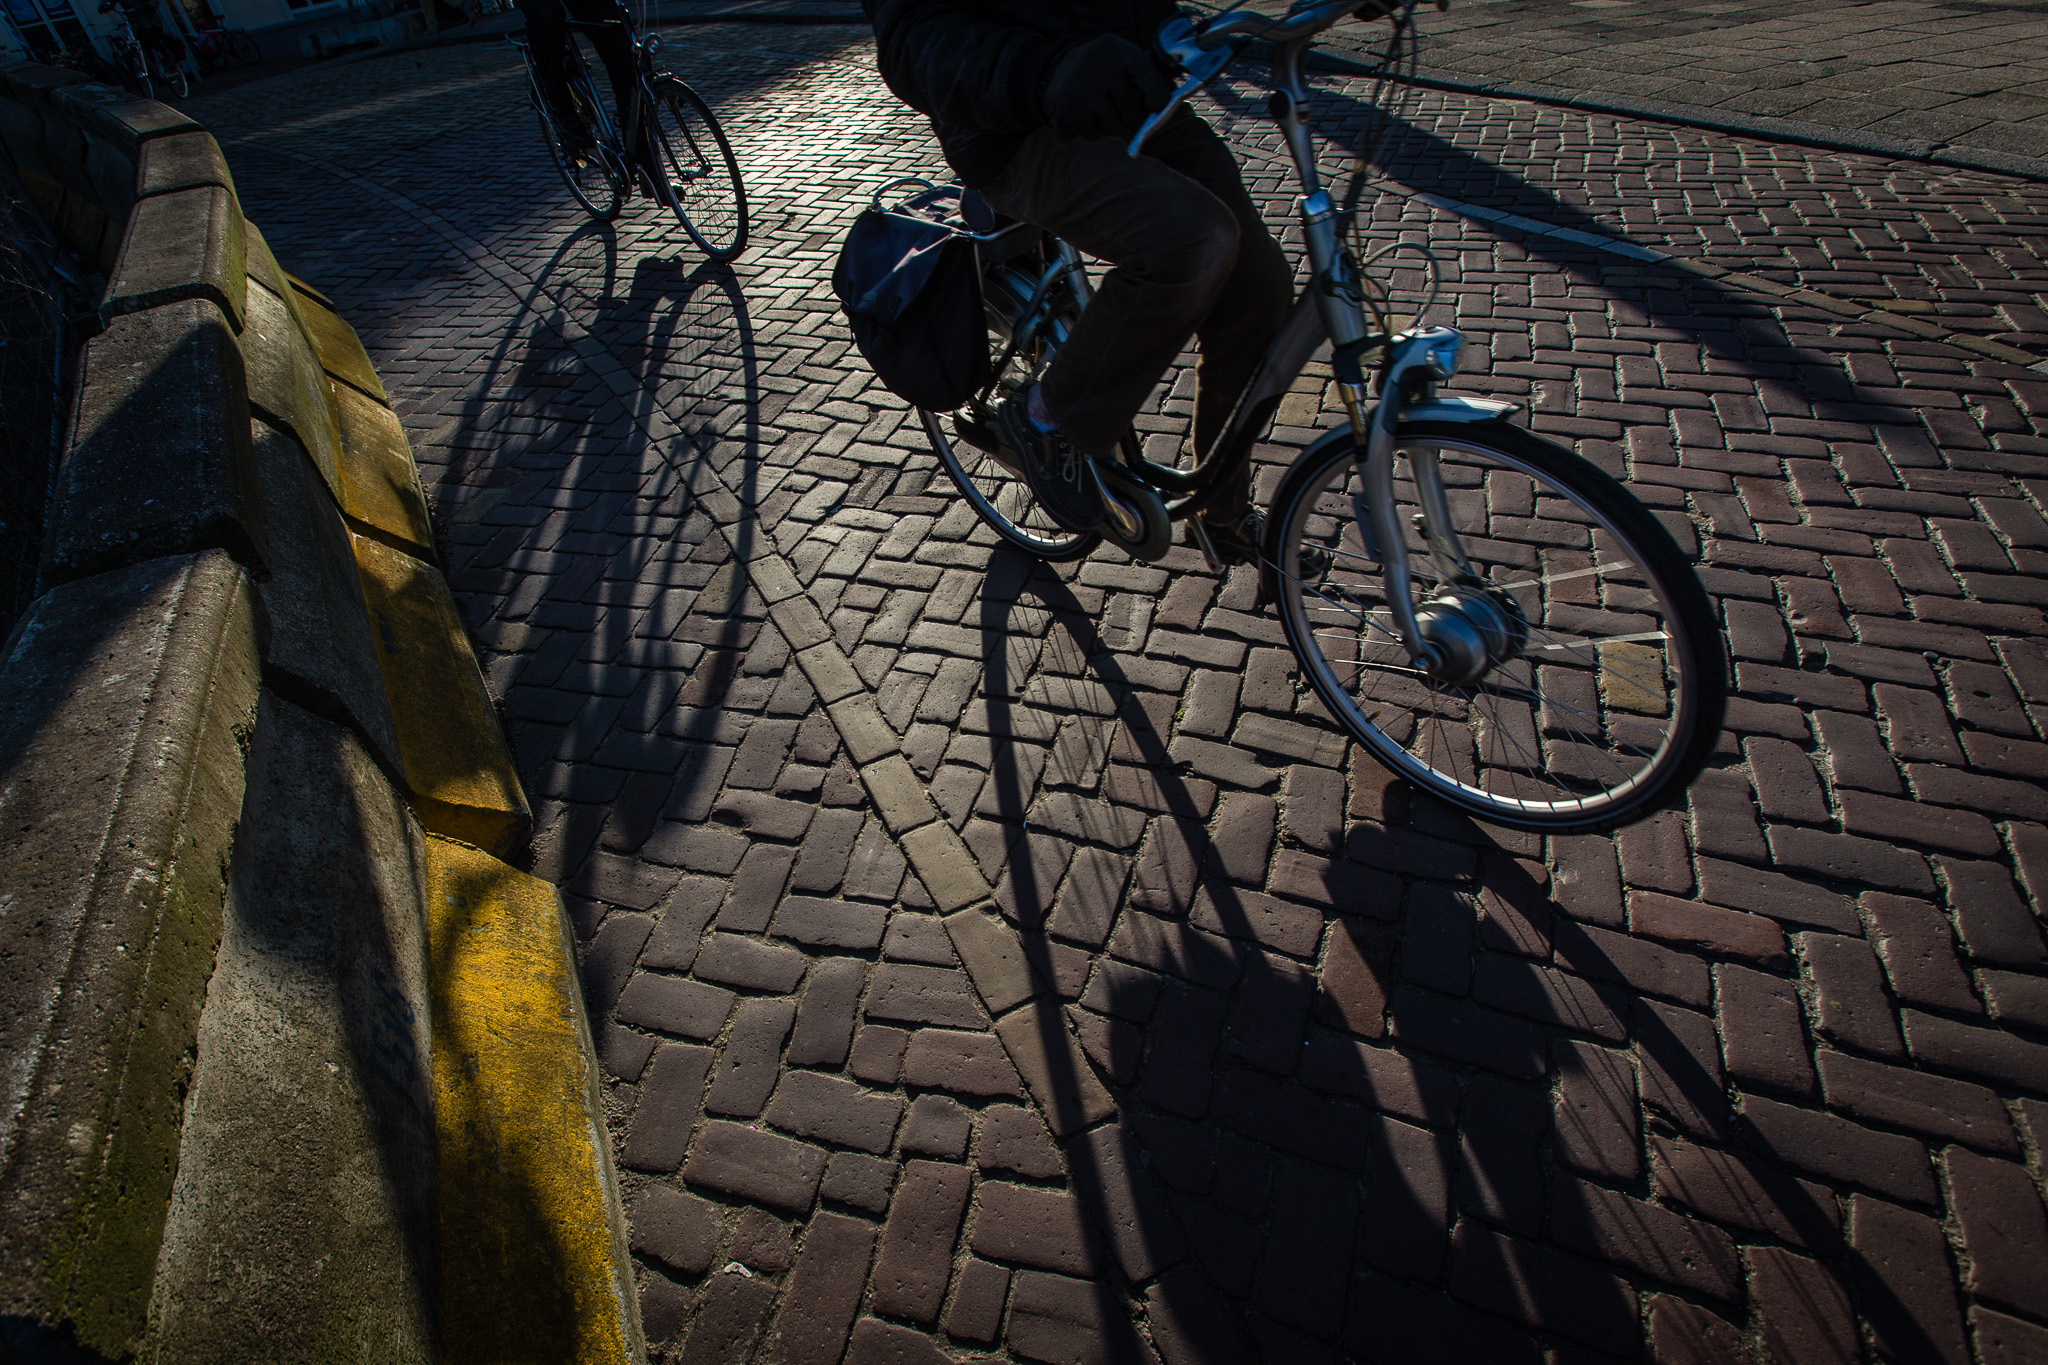 fietsen_08